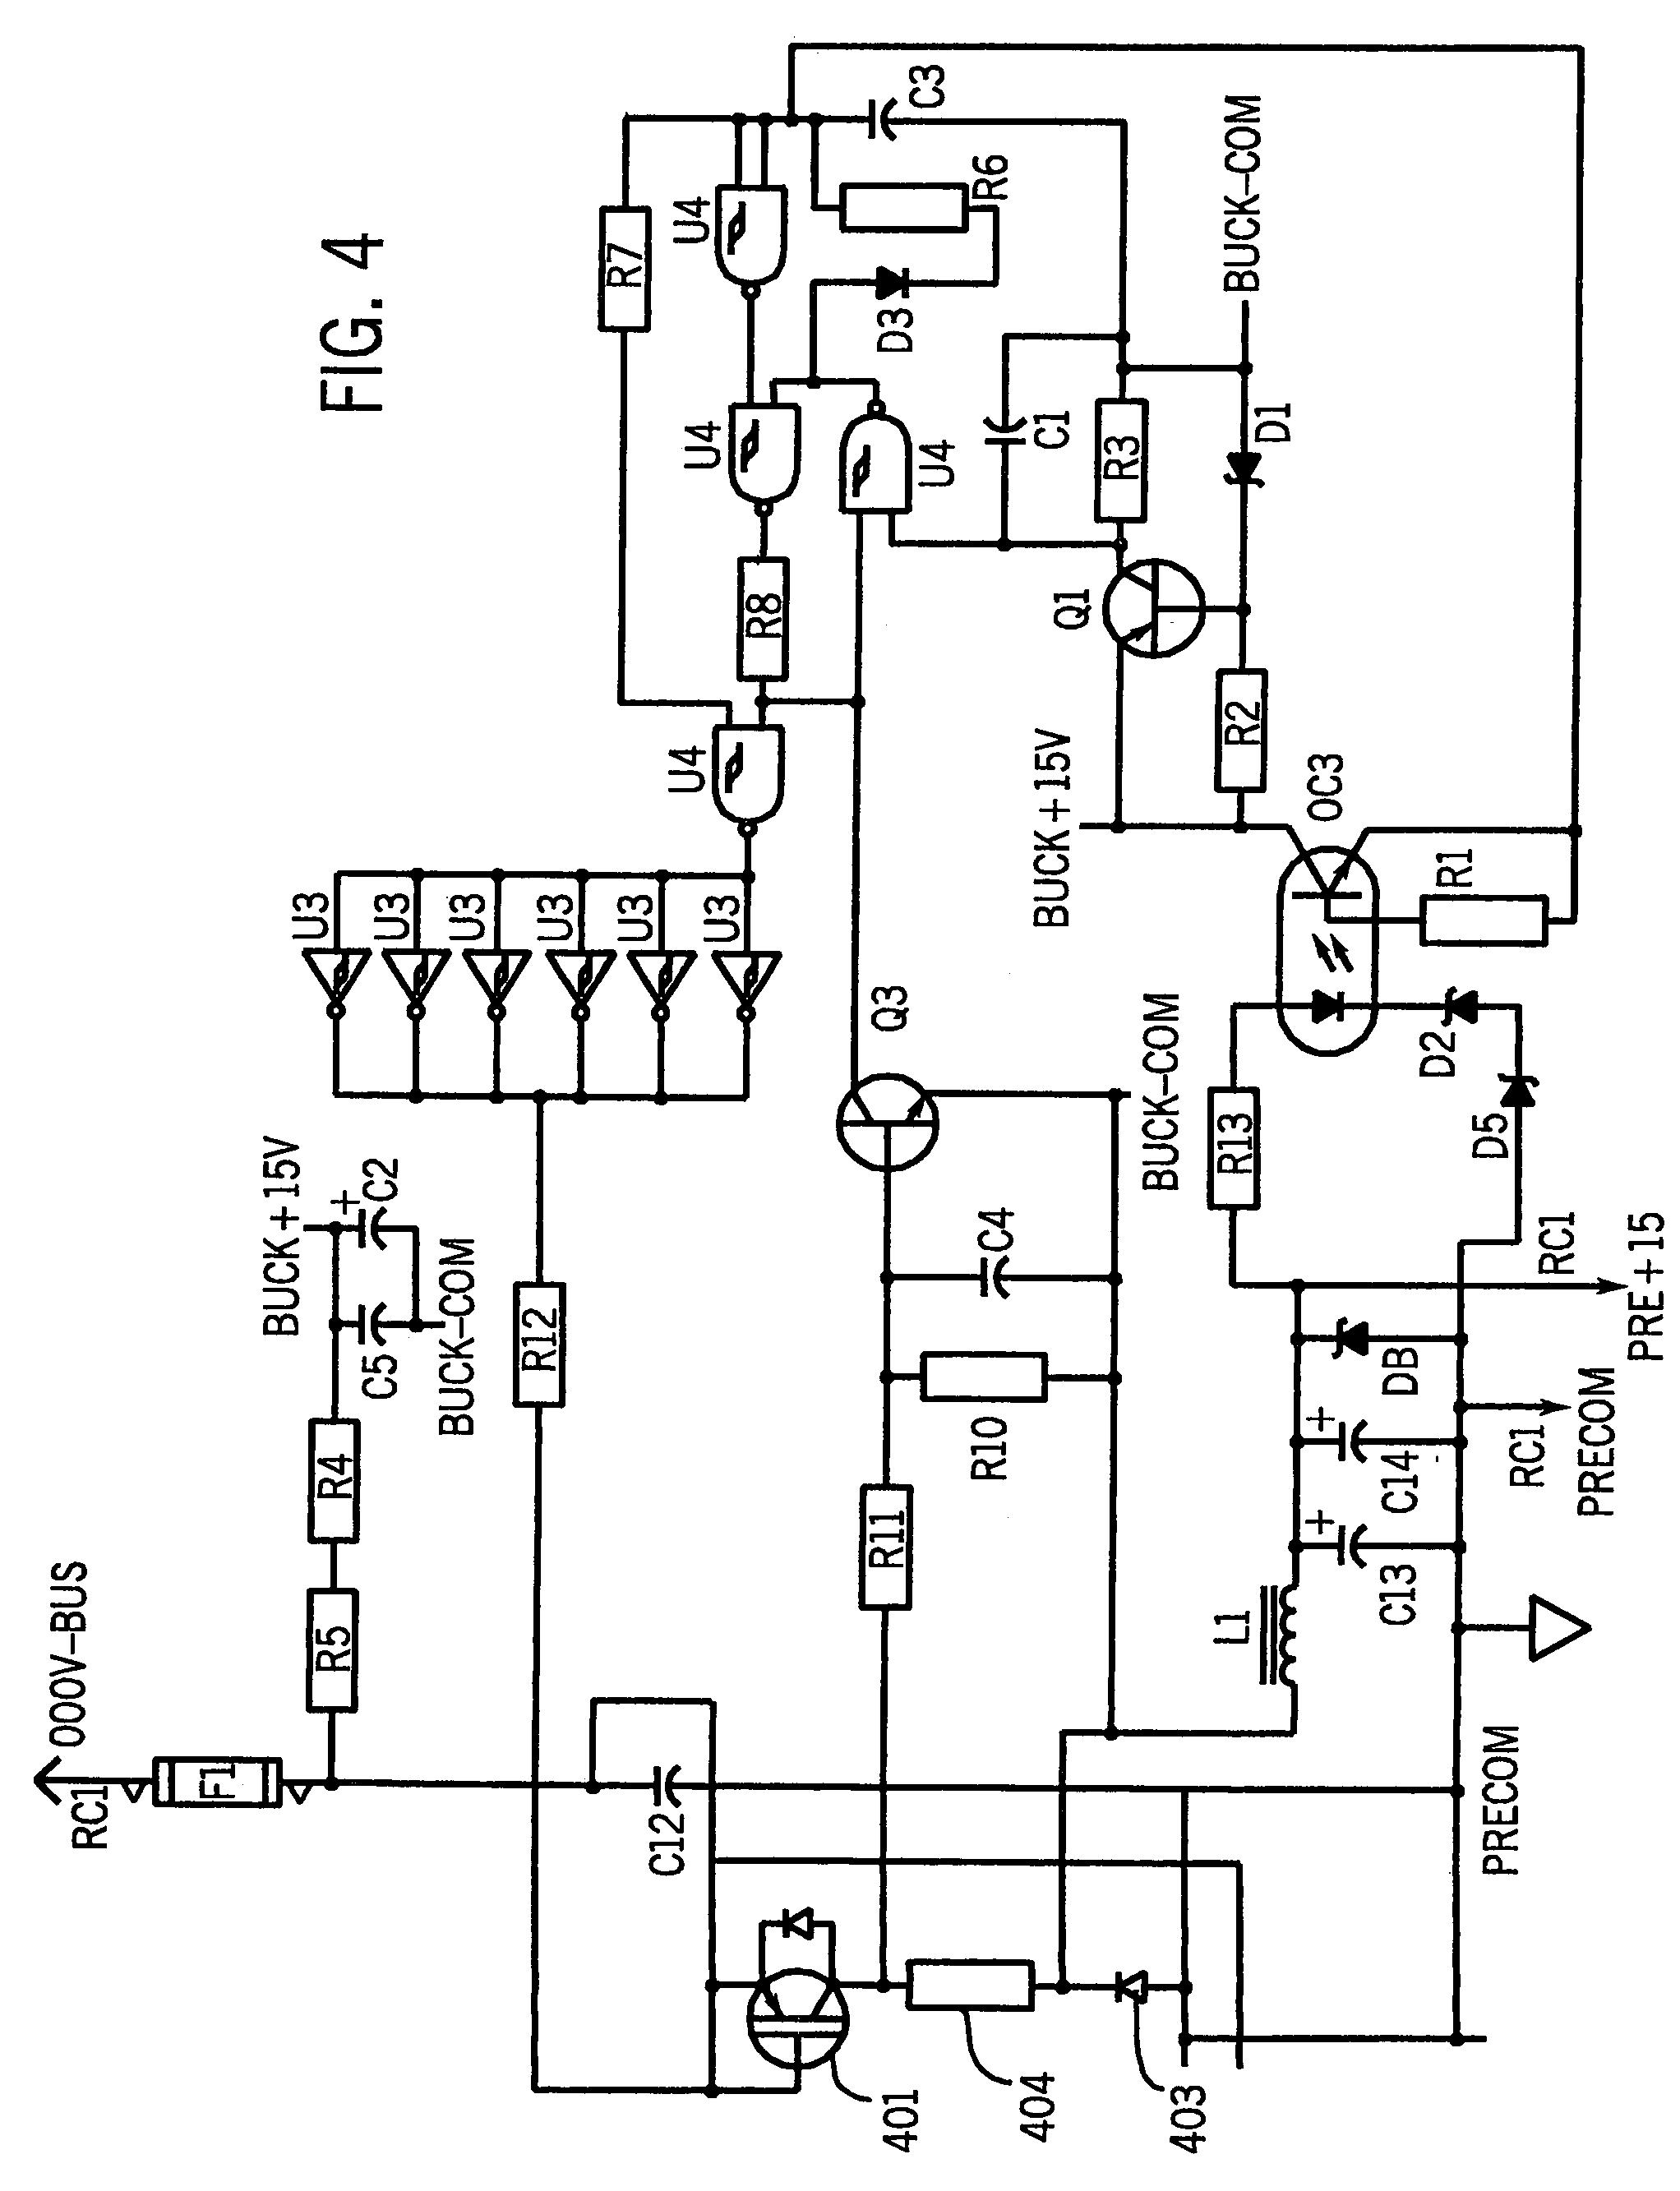 miller 200 welder wiring diagram for a millermatic 200 parts miller bobcat 225 welder parts